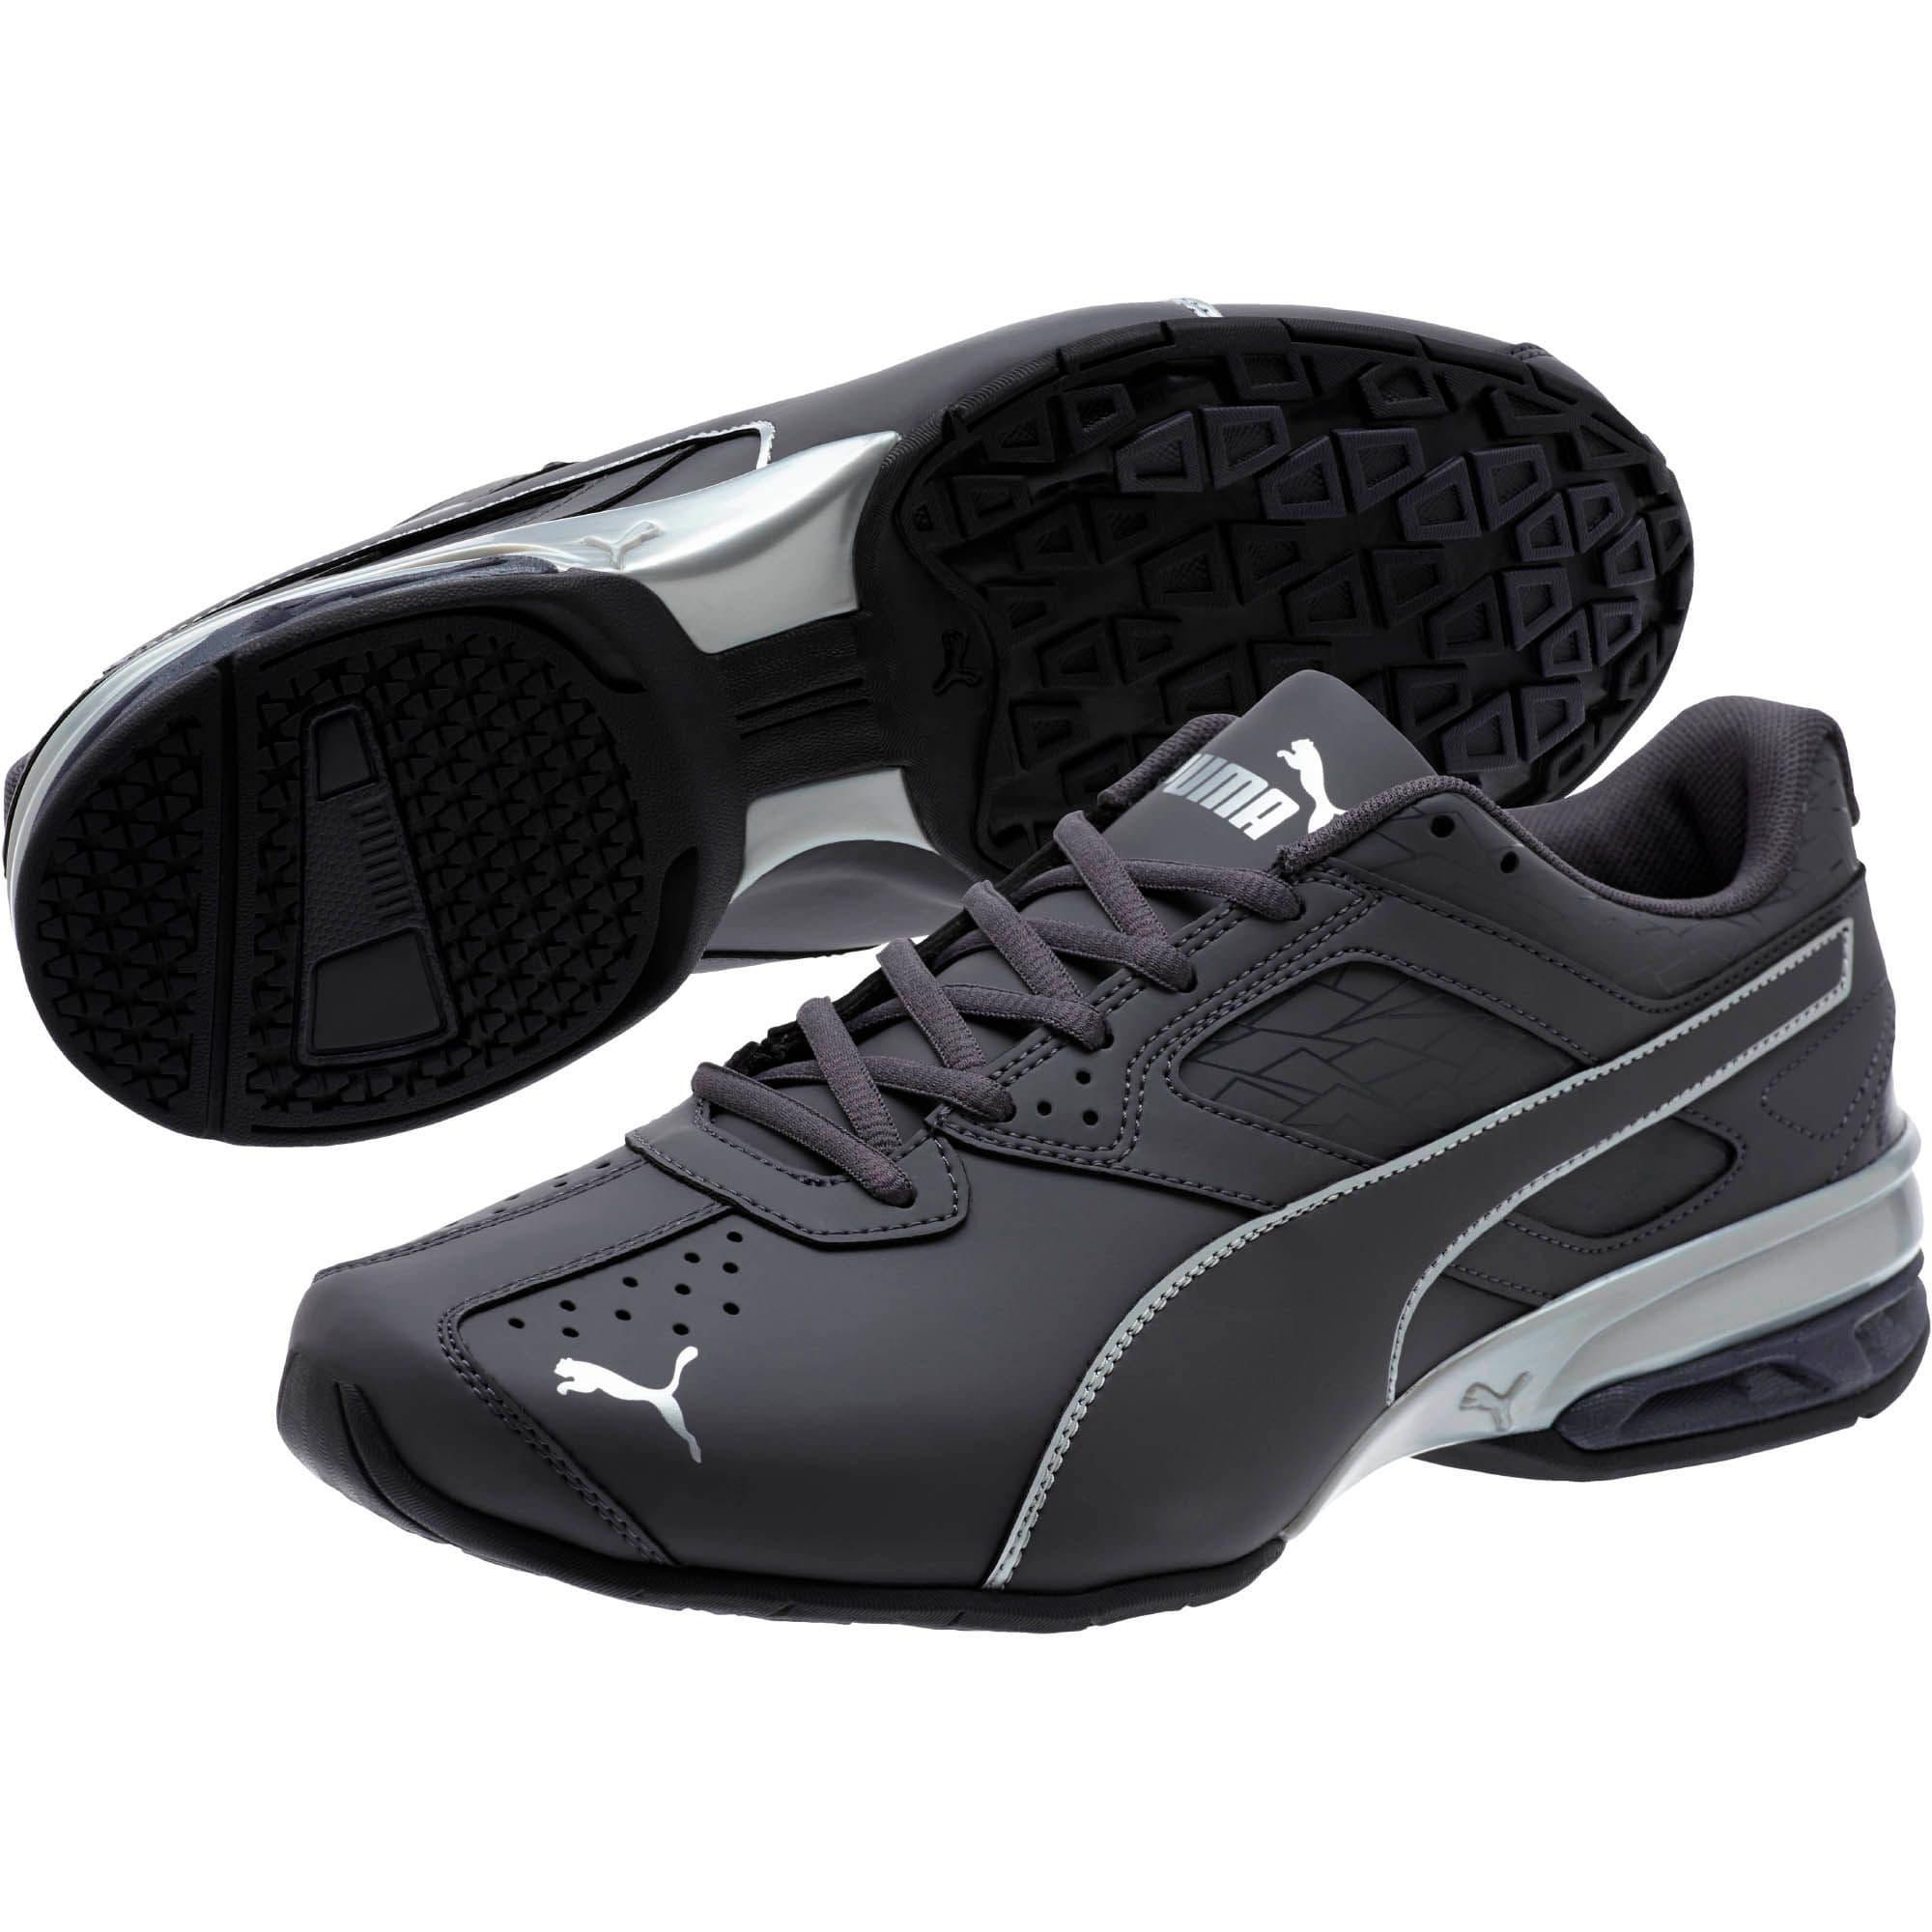 Thumbnail 2 of Tazon 6 Fracture FM Men's Sneakers, periscope-silver, medium